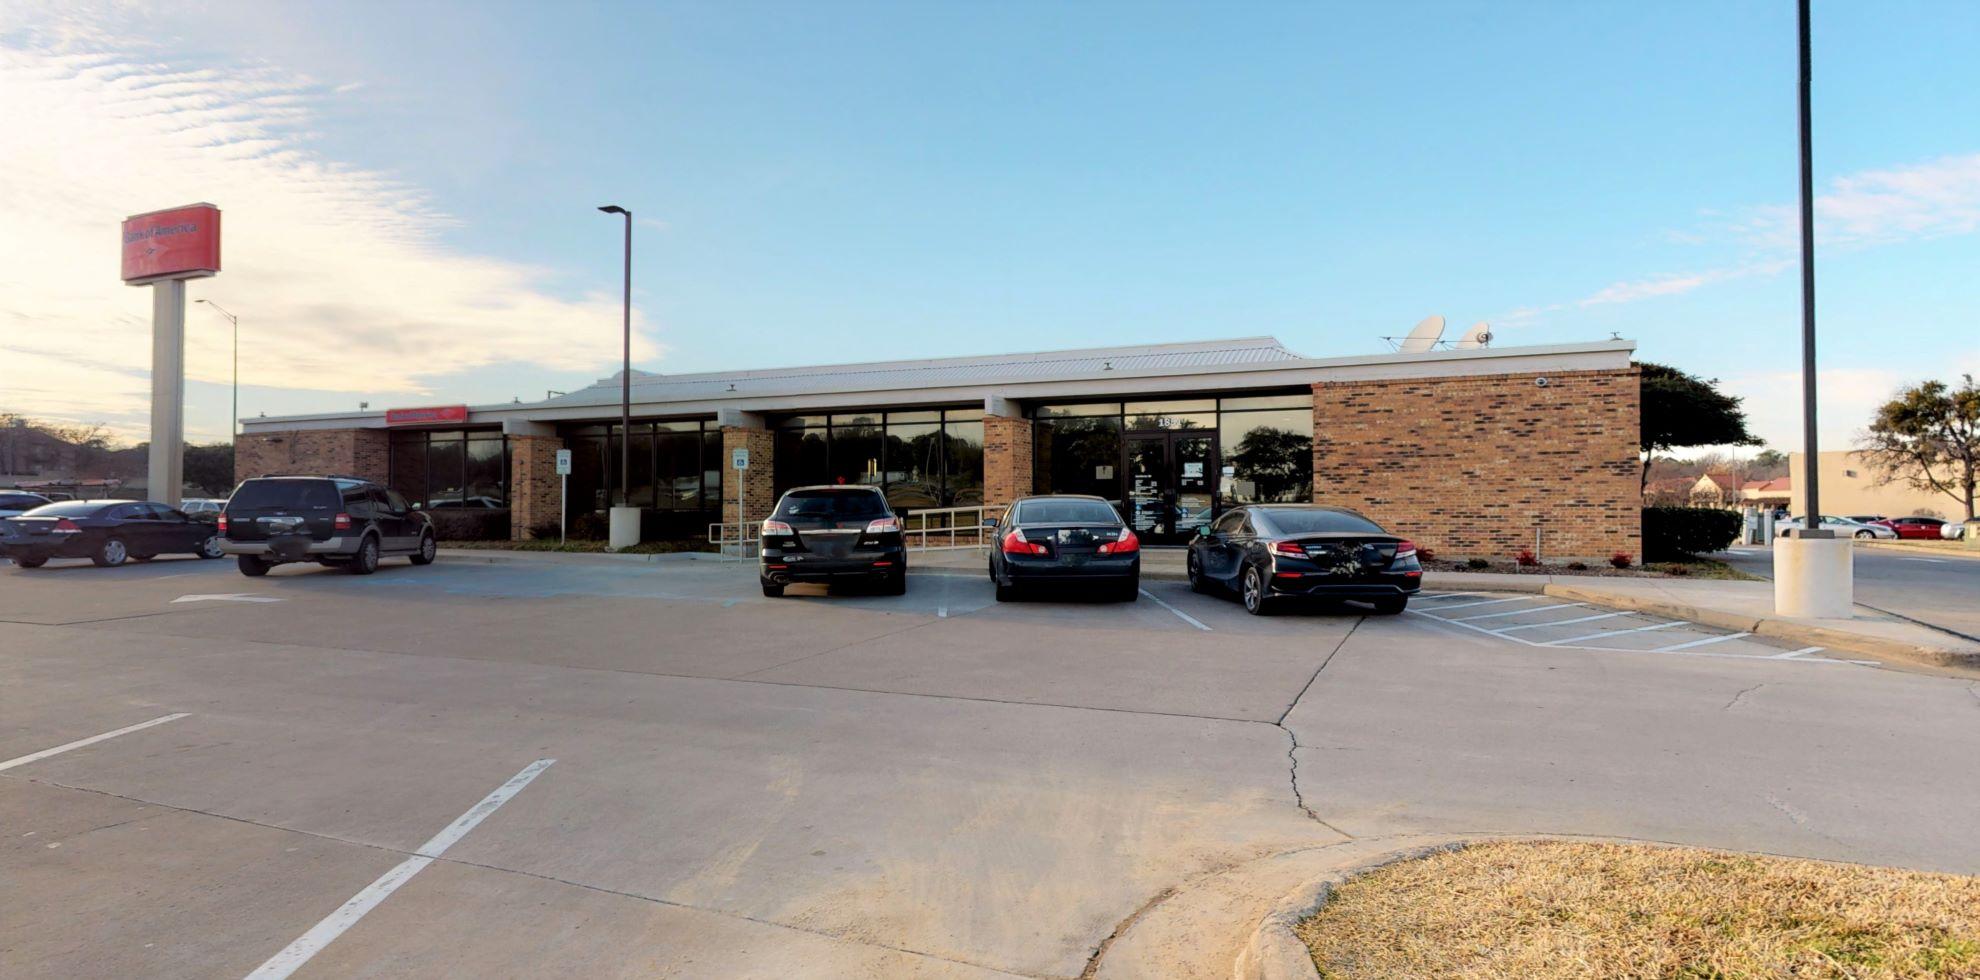 Bank of America financial center with drive-thru ATM | 1851 S Interstate 35 E, Denton, TX 76205